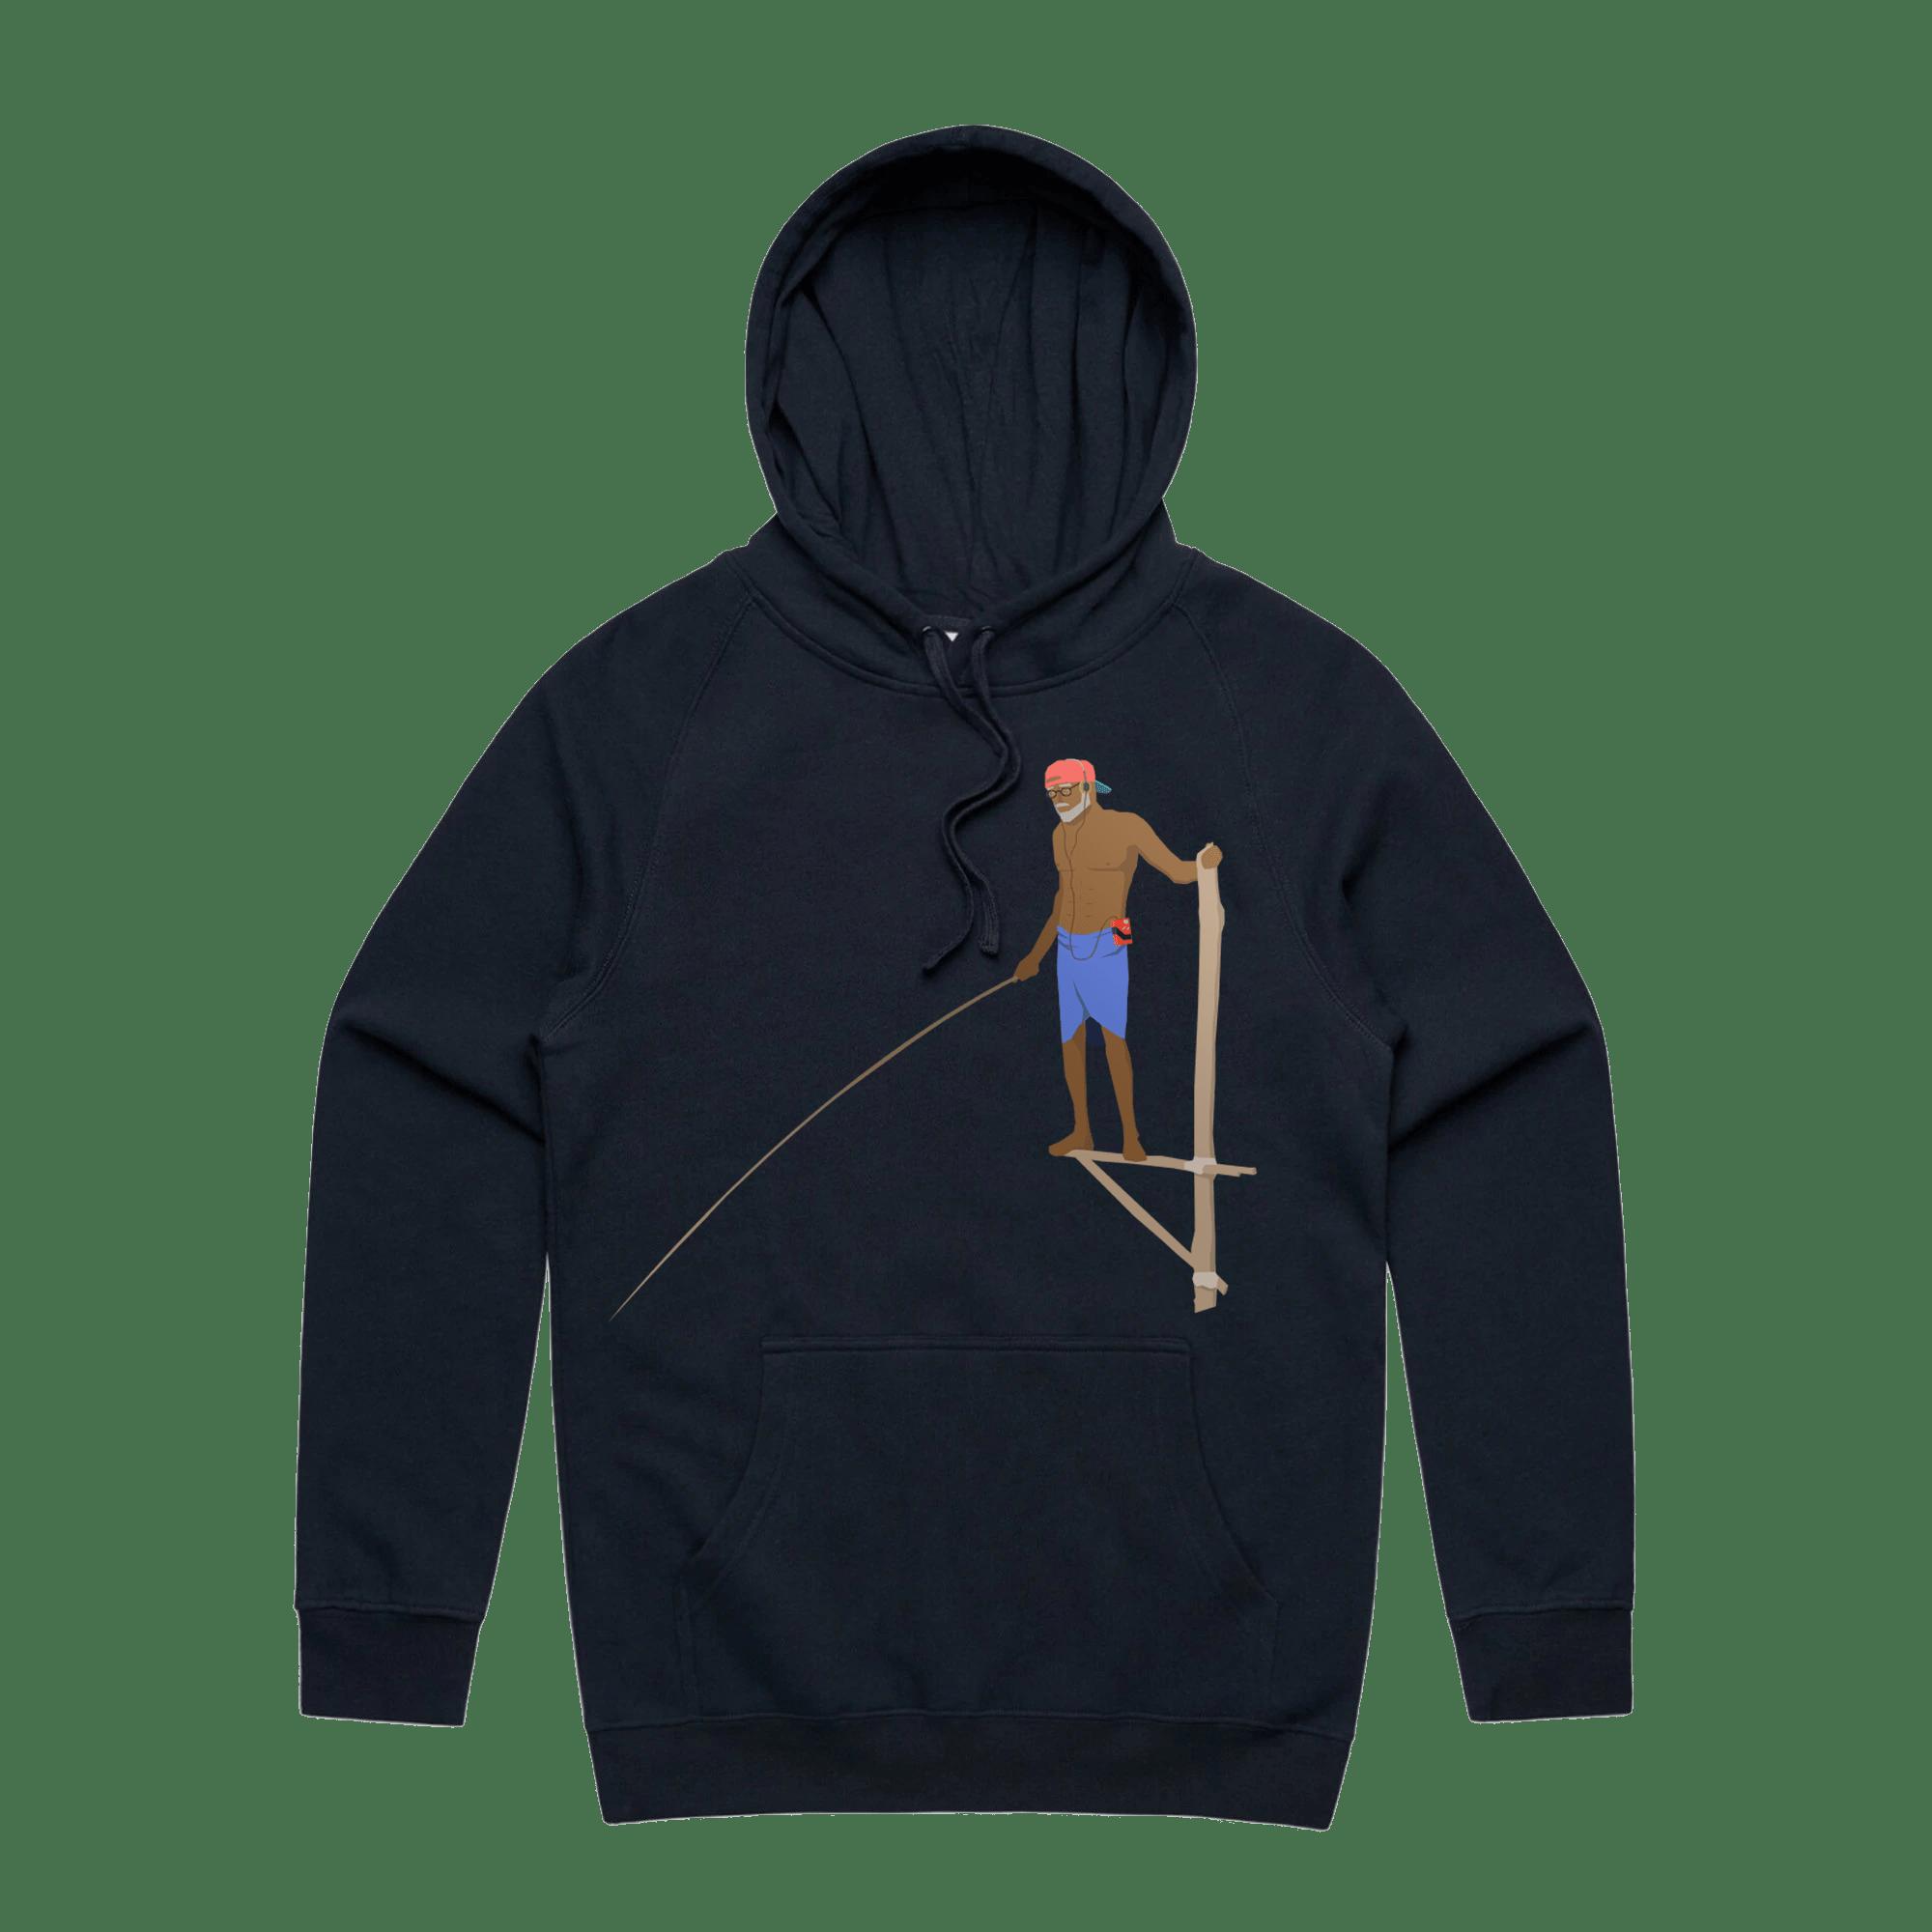 RETRO FISHERMAN Hoodie - NAVY